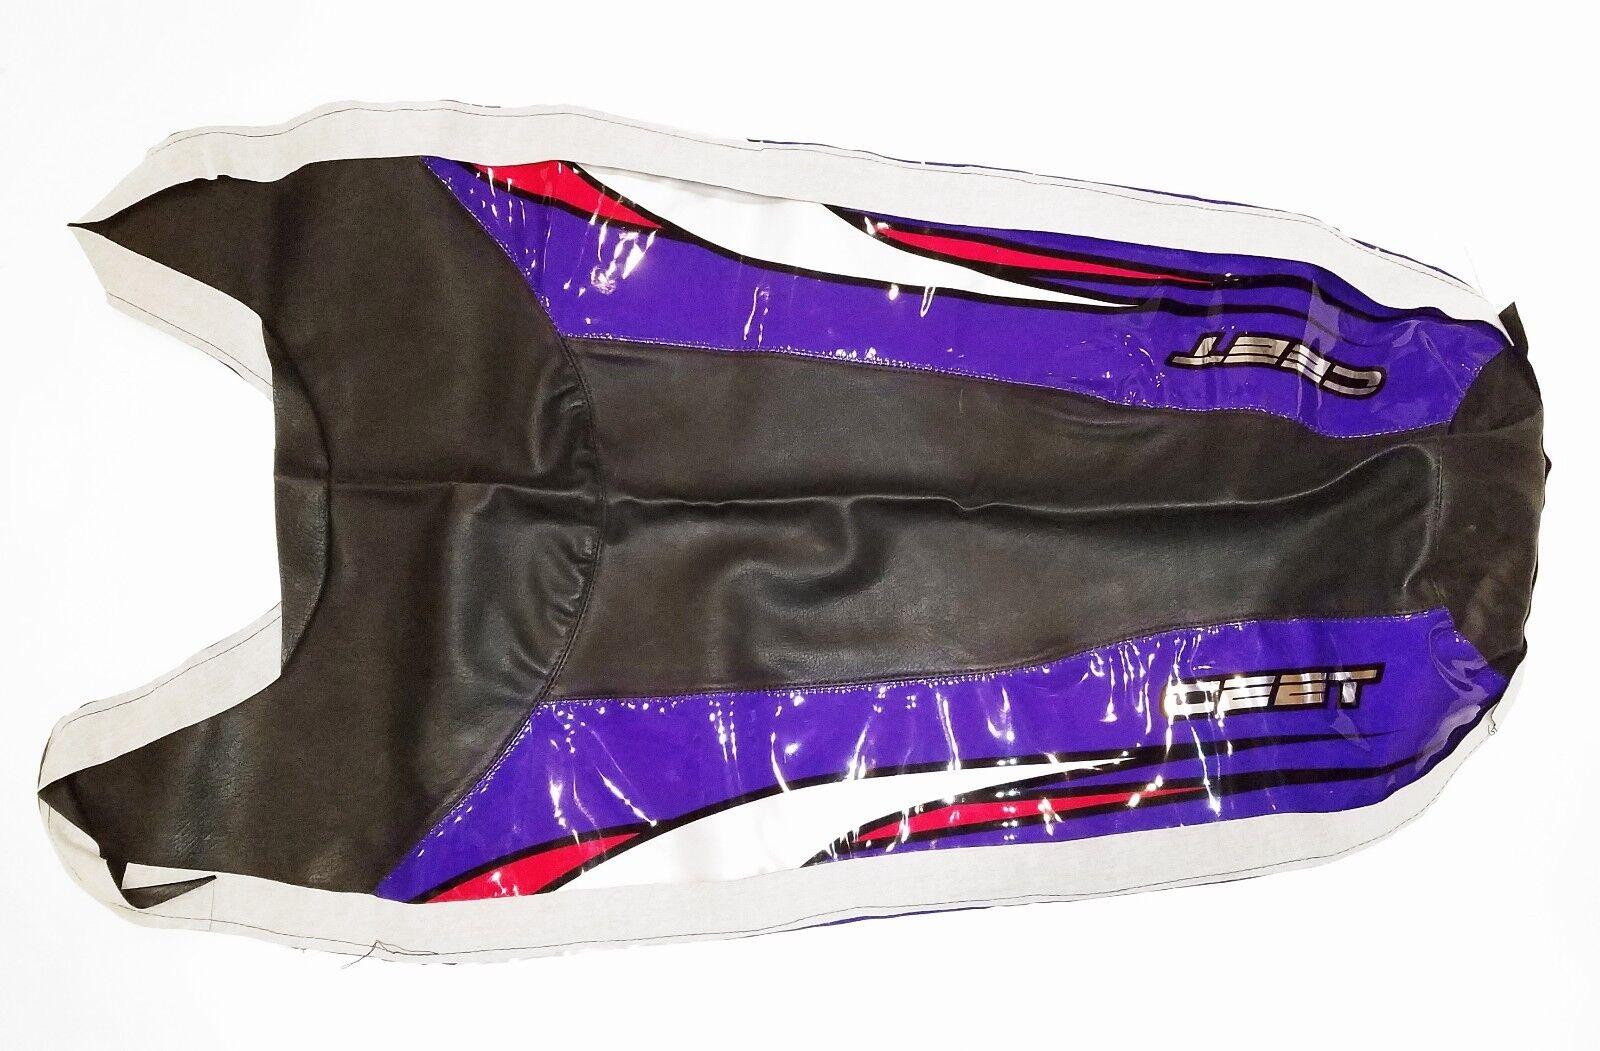 Ceet Racing Kawasaki Zxi Sitzbezug - Schwarz und Lila